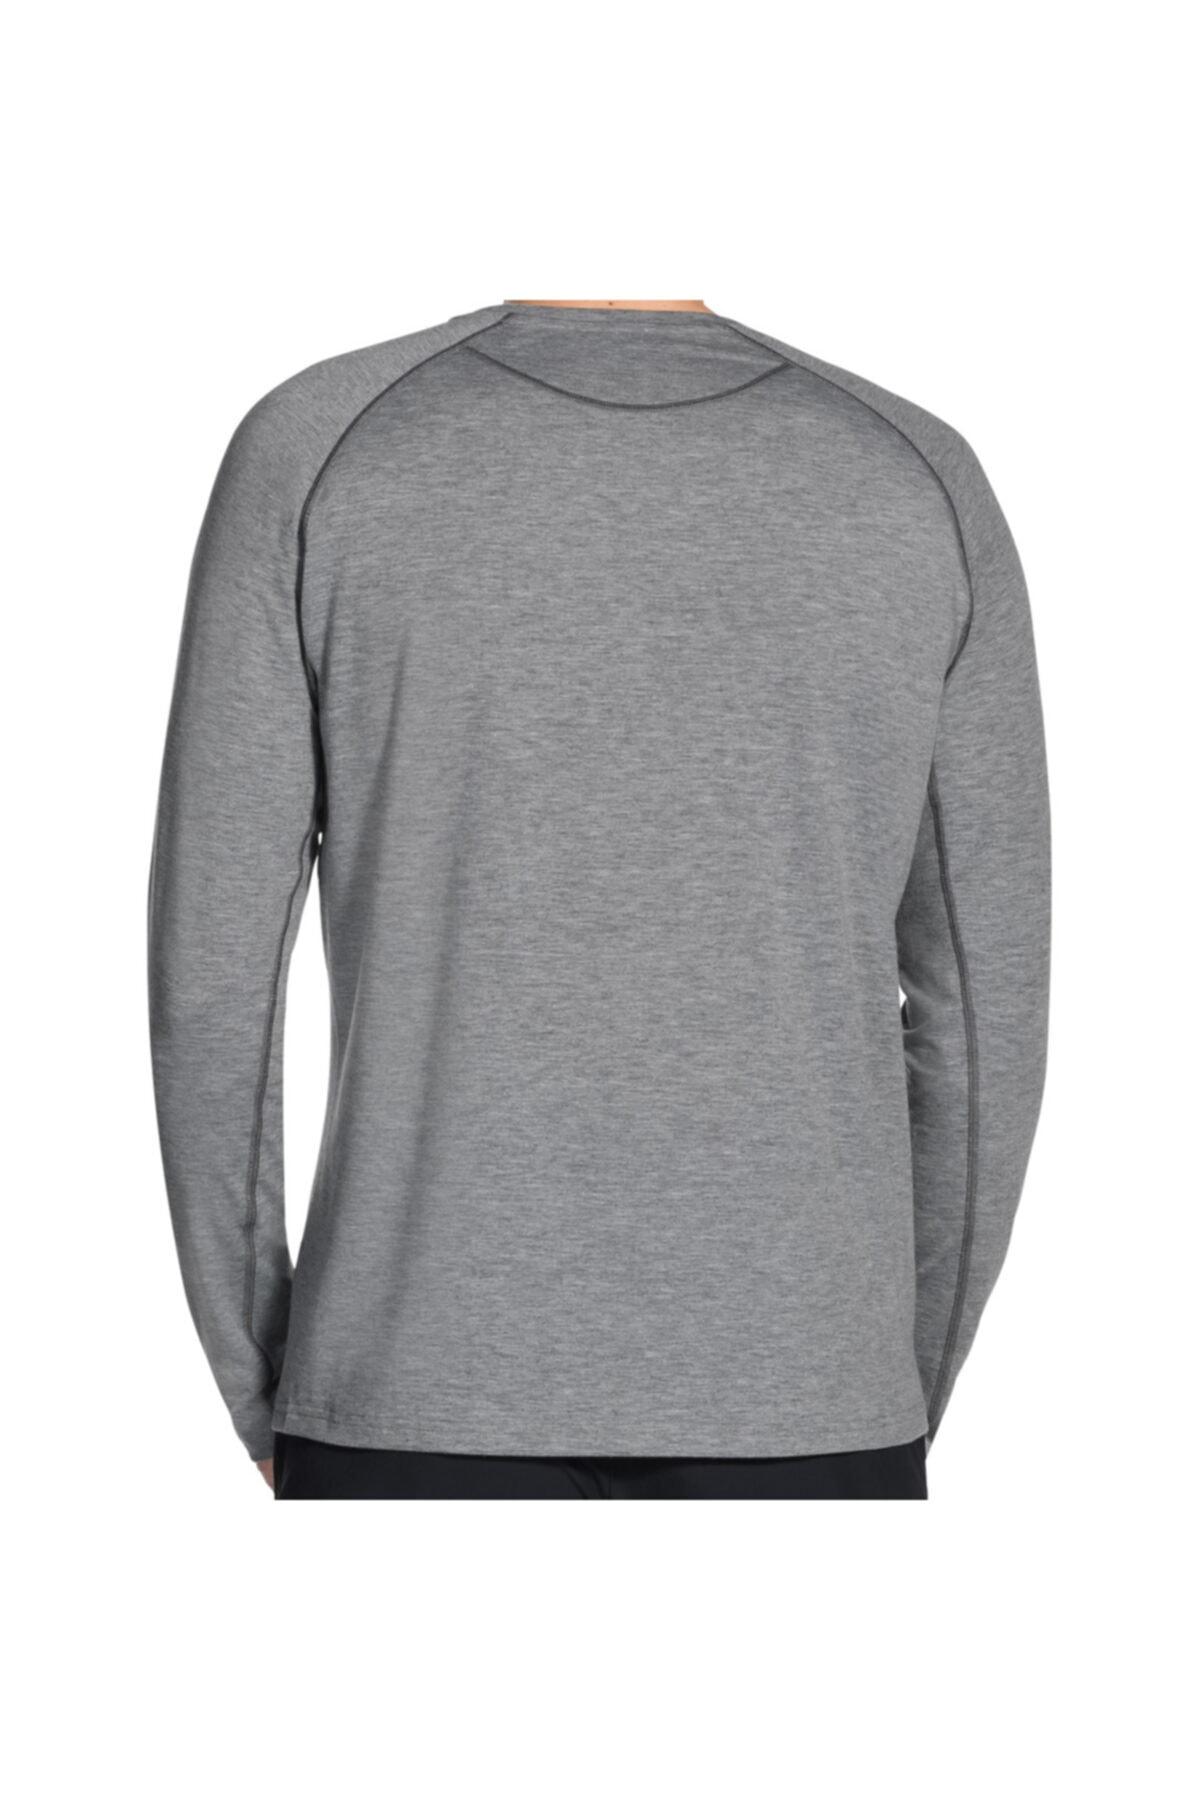 VAUDE Signpost Uzun Kollu Erkek T-shirt 40916 2